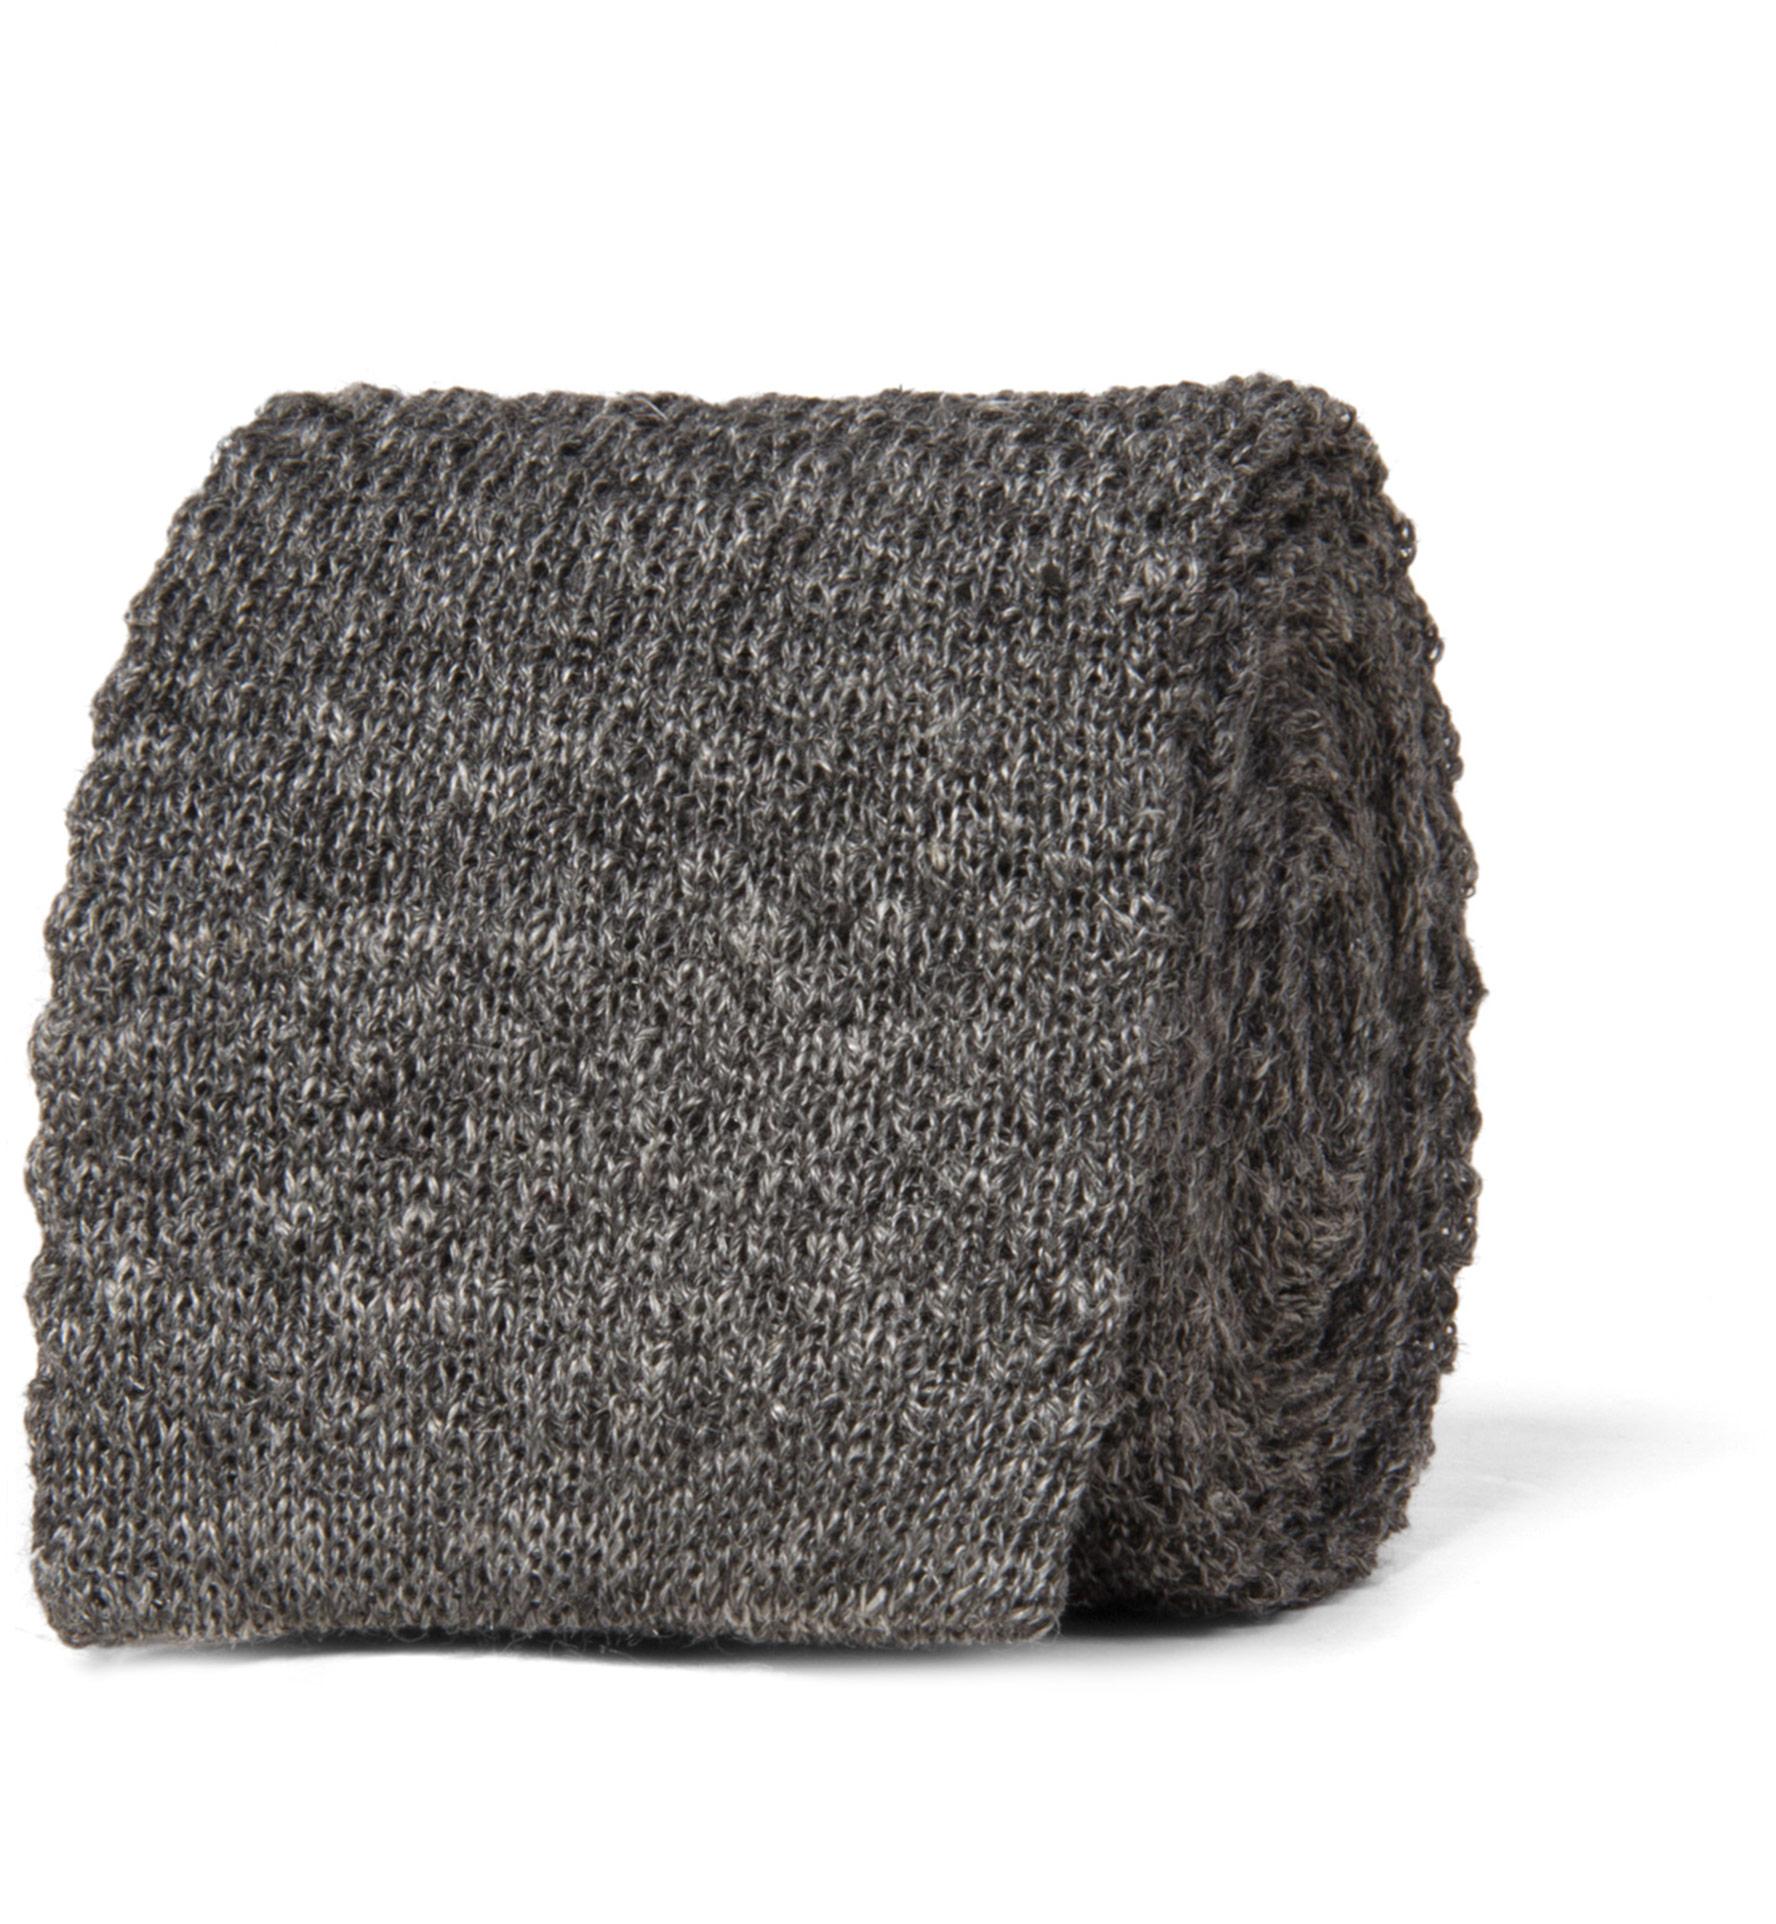 Zoom Image of Grey Linen Knit Tie